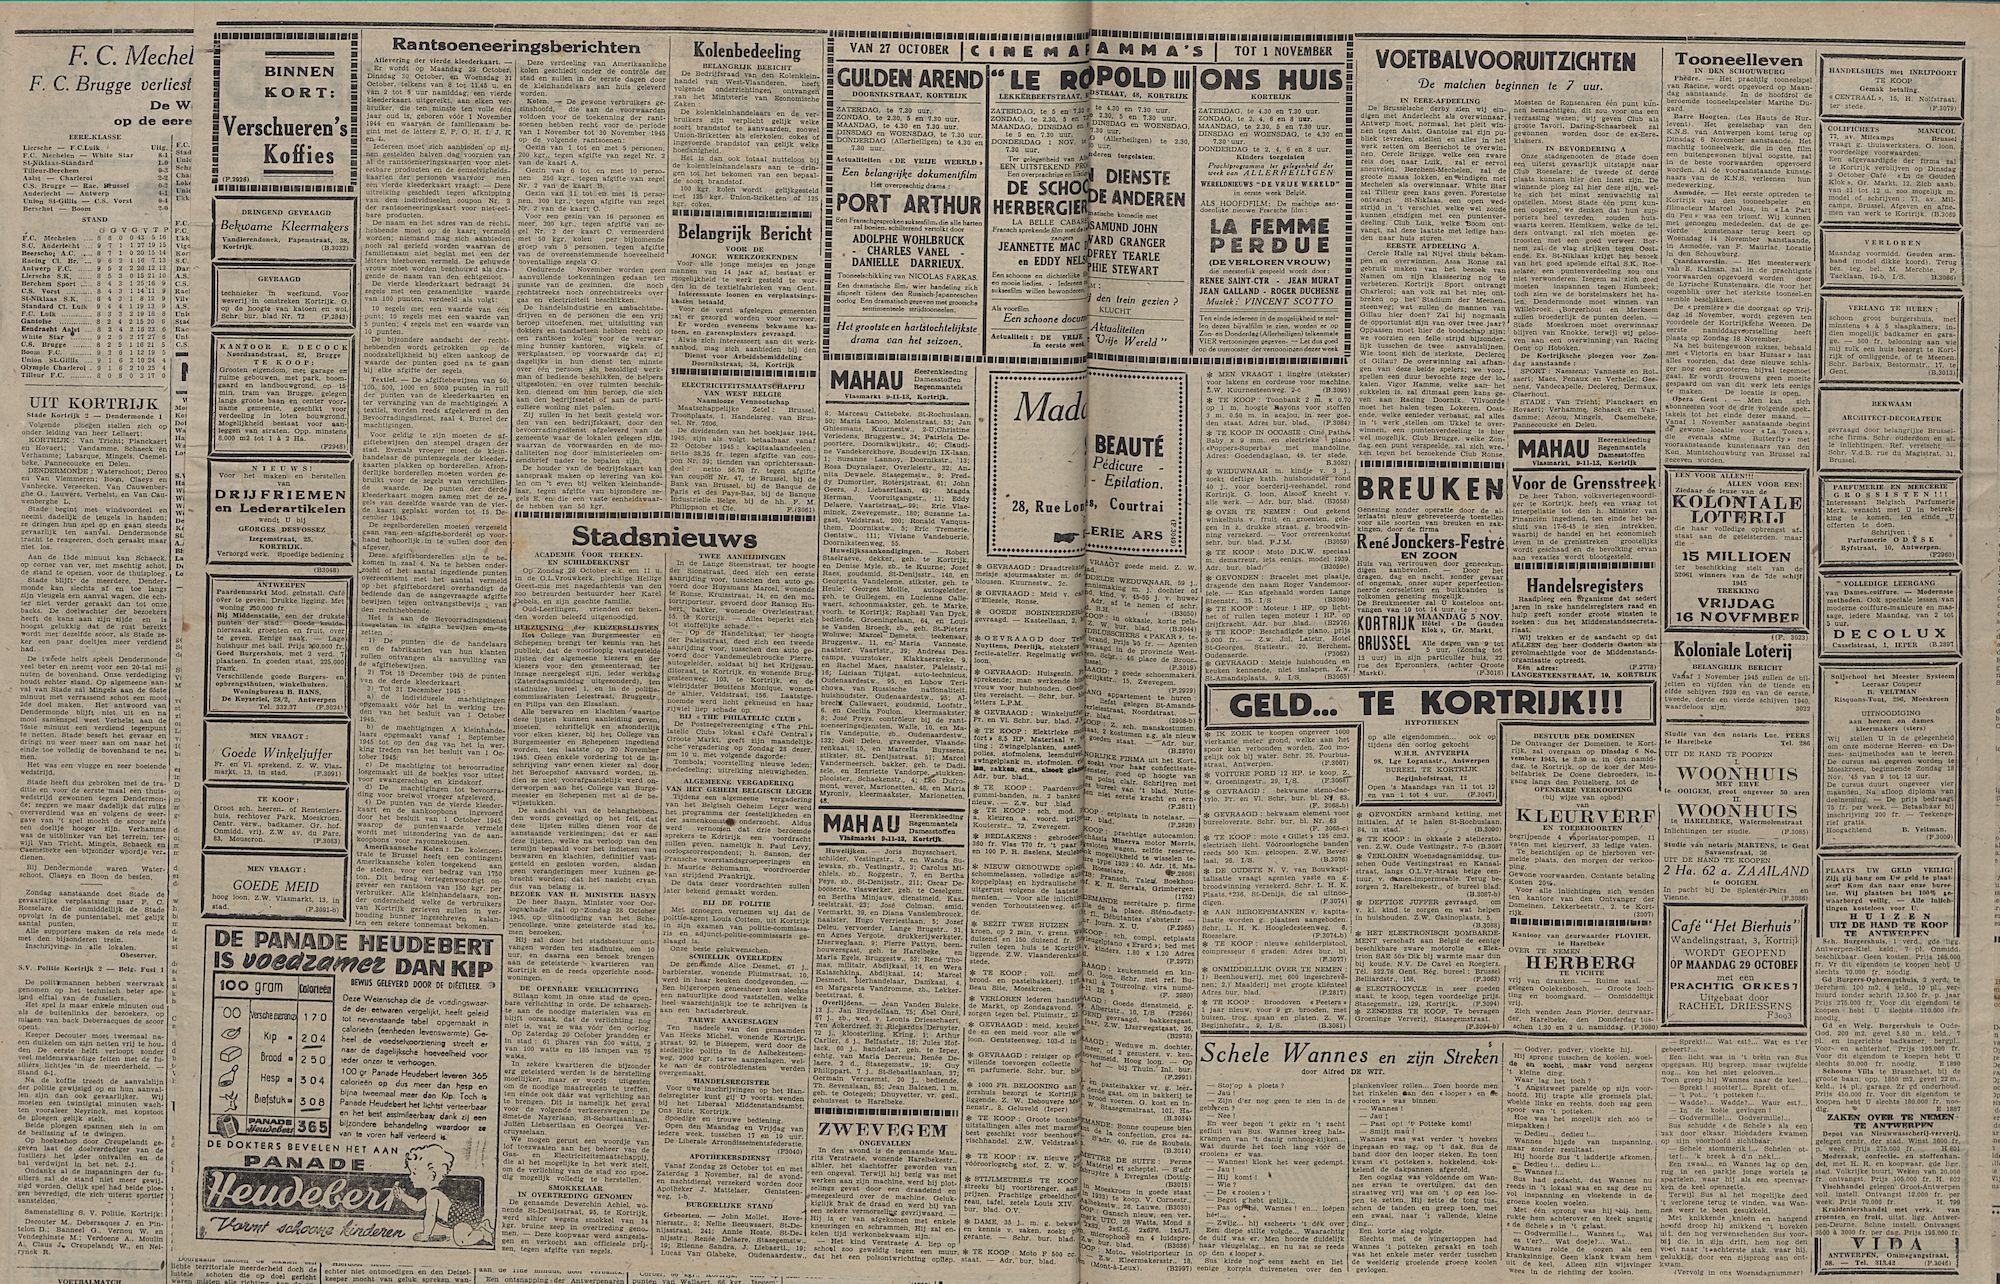 Kortrijksch Handelsblad 26 october 1945 Nr86 p2 en 3